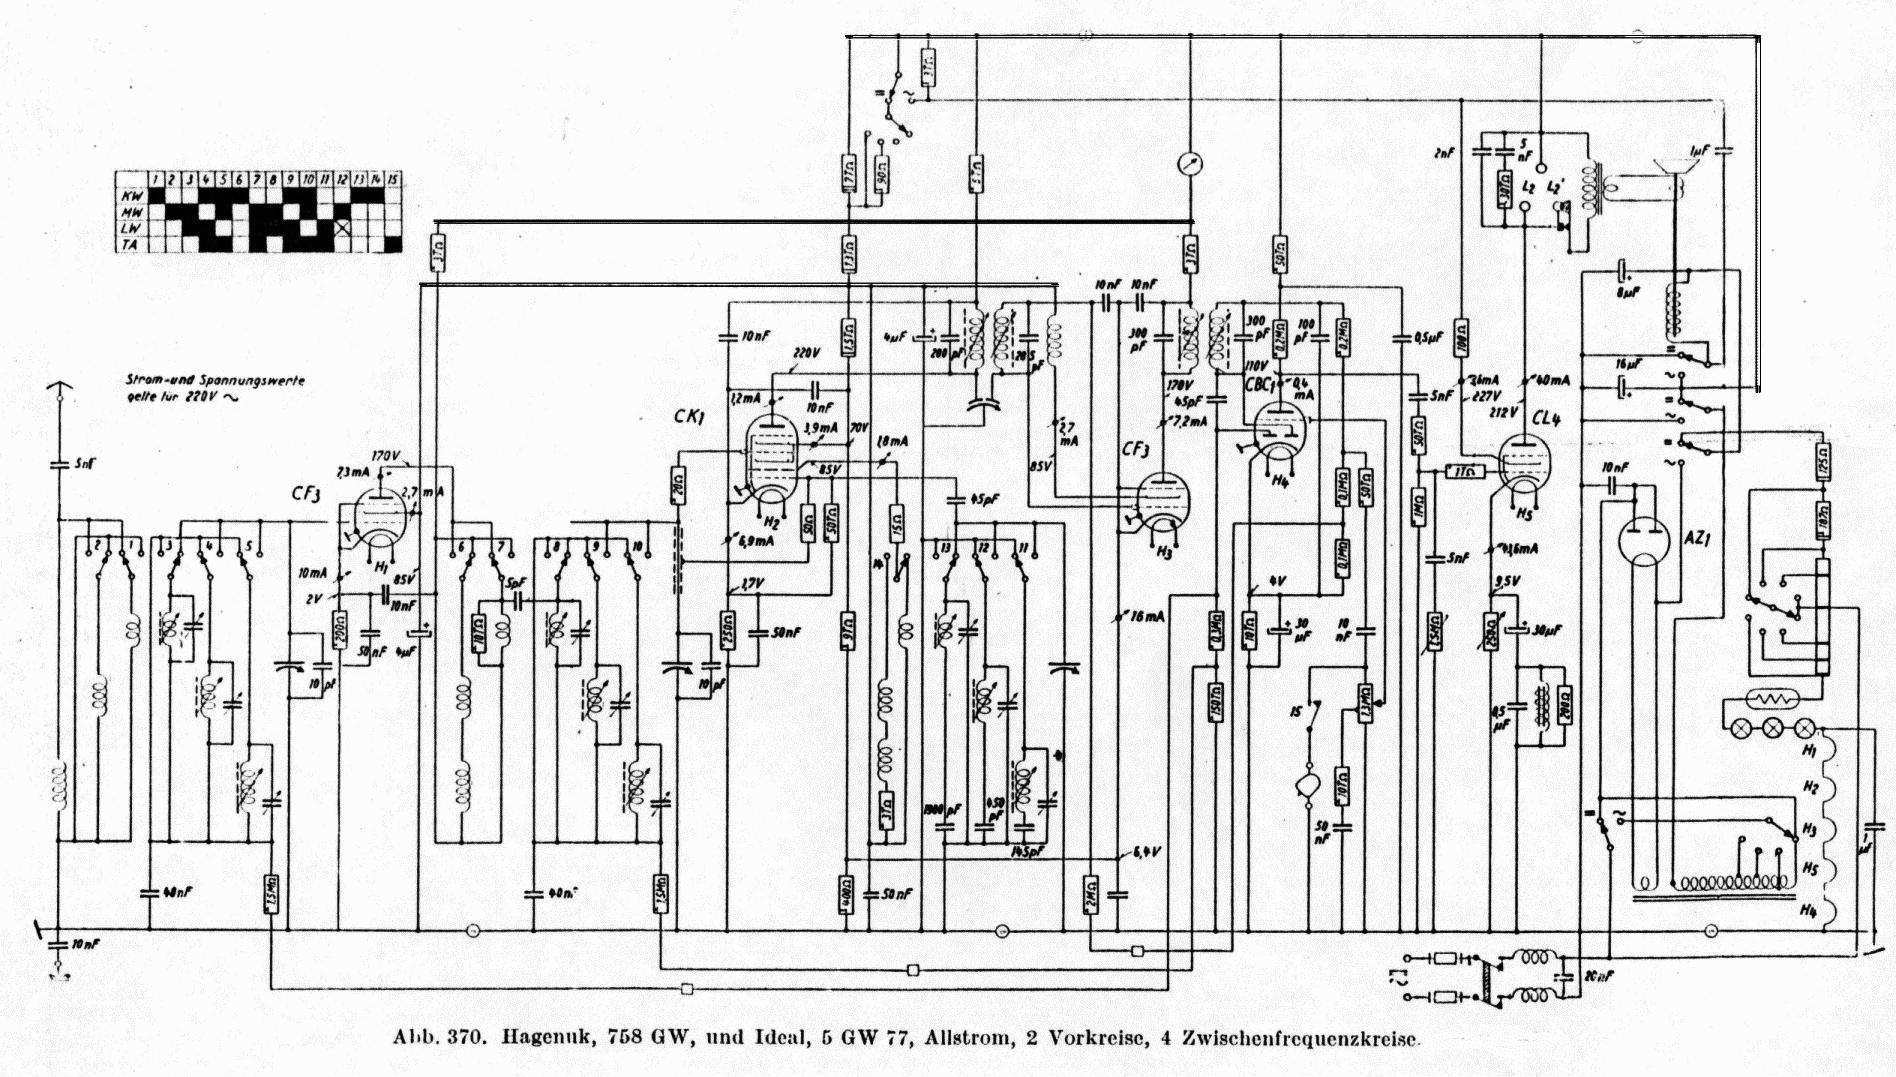 Großartig 110v Ausgangs Schaltplan Bilder - Der Schaltplan ...